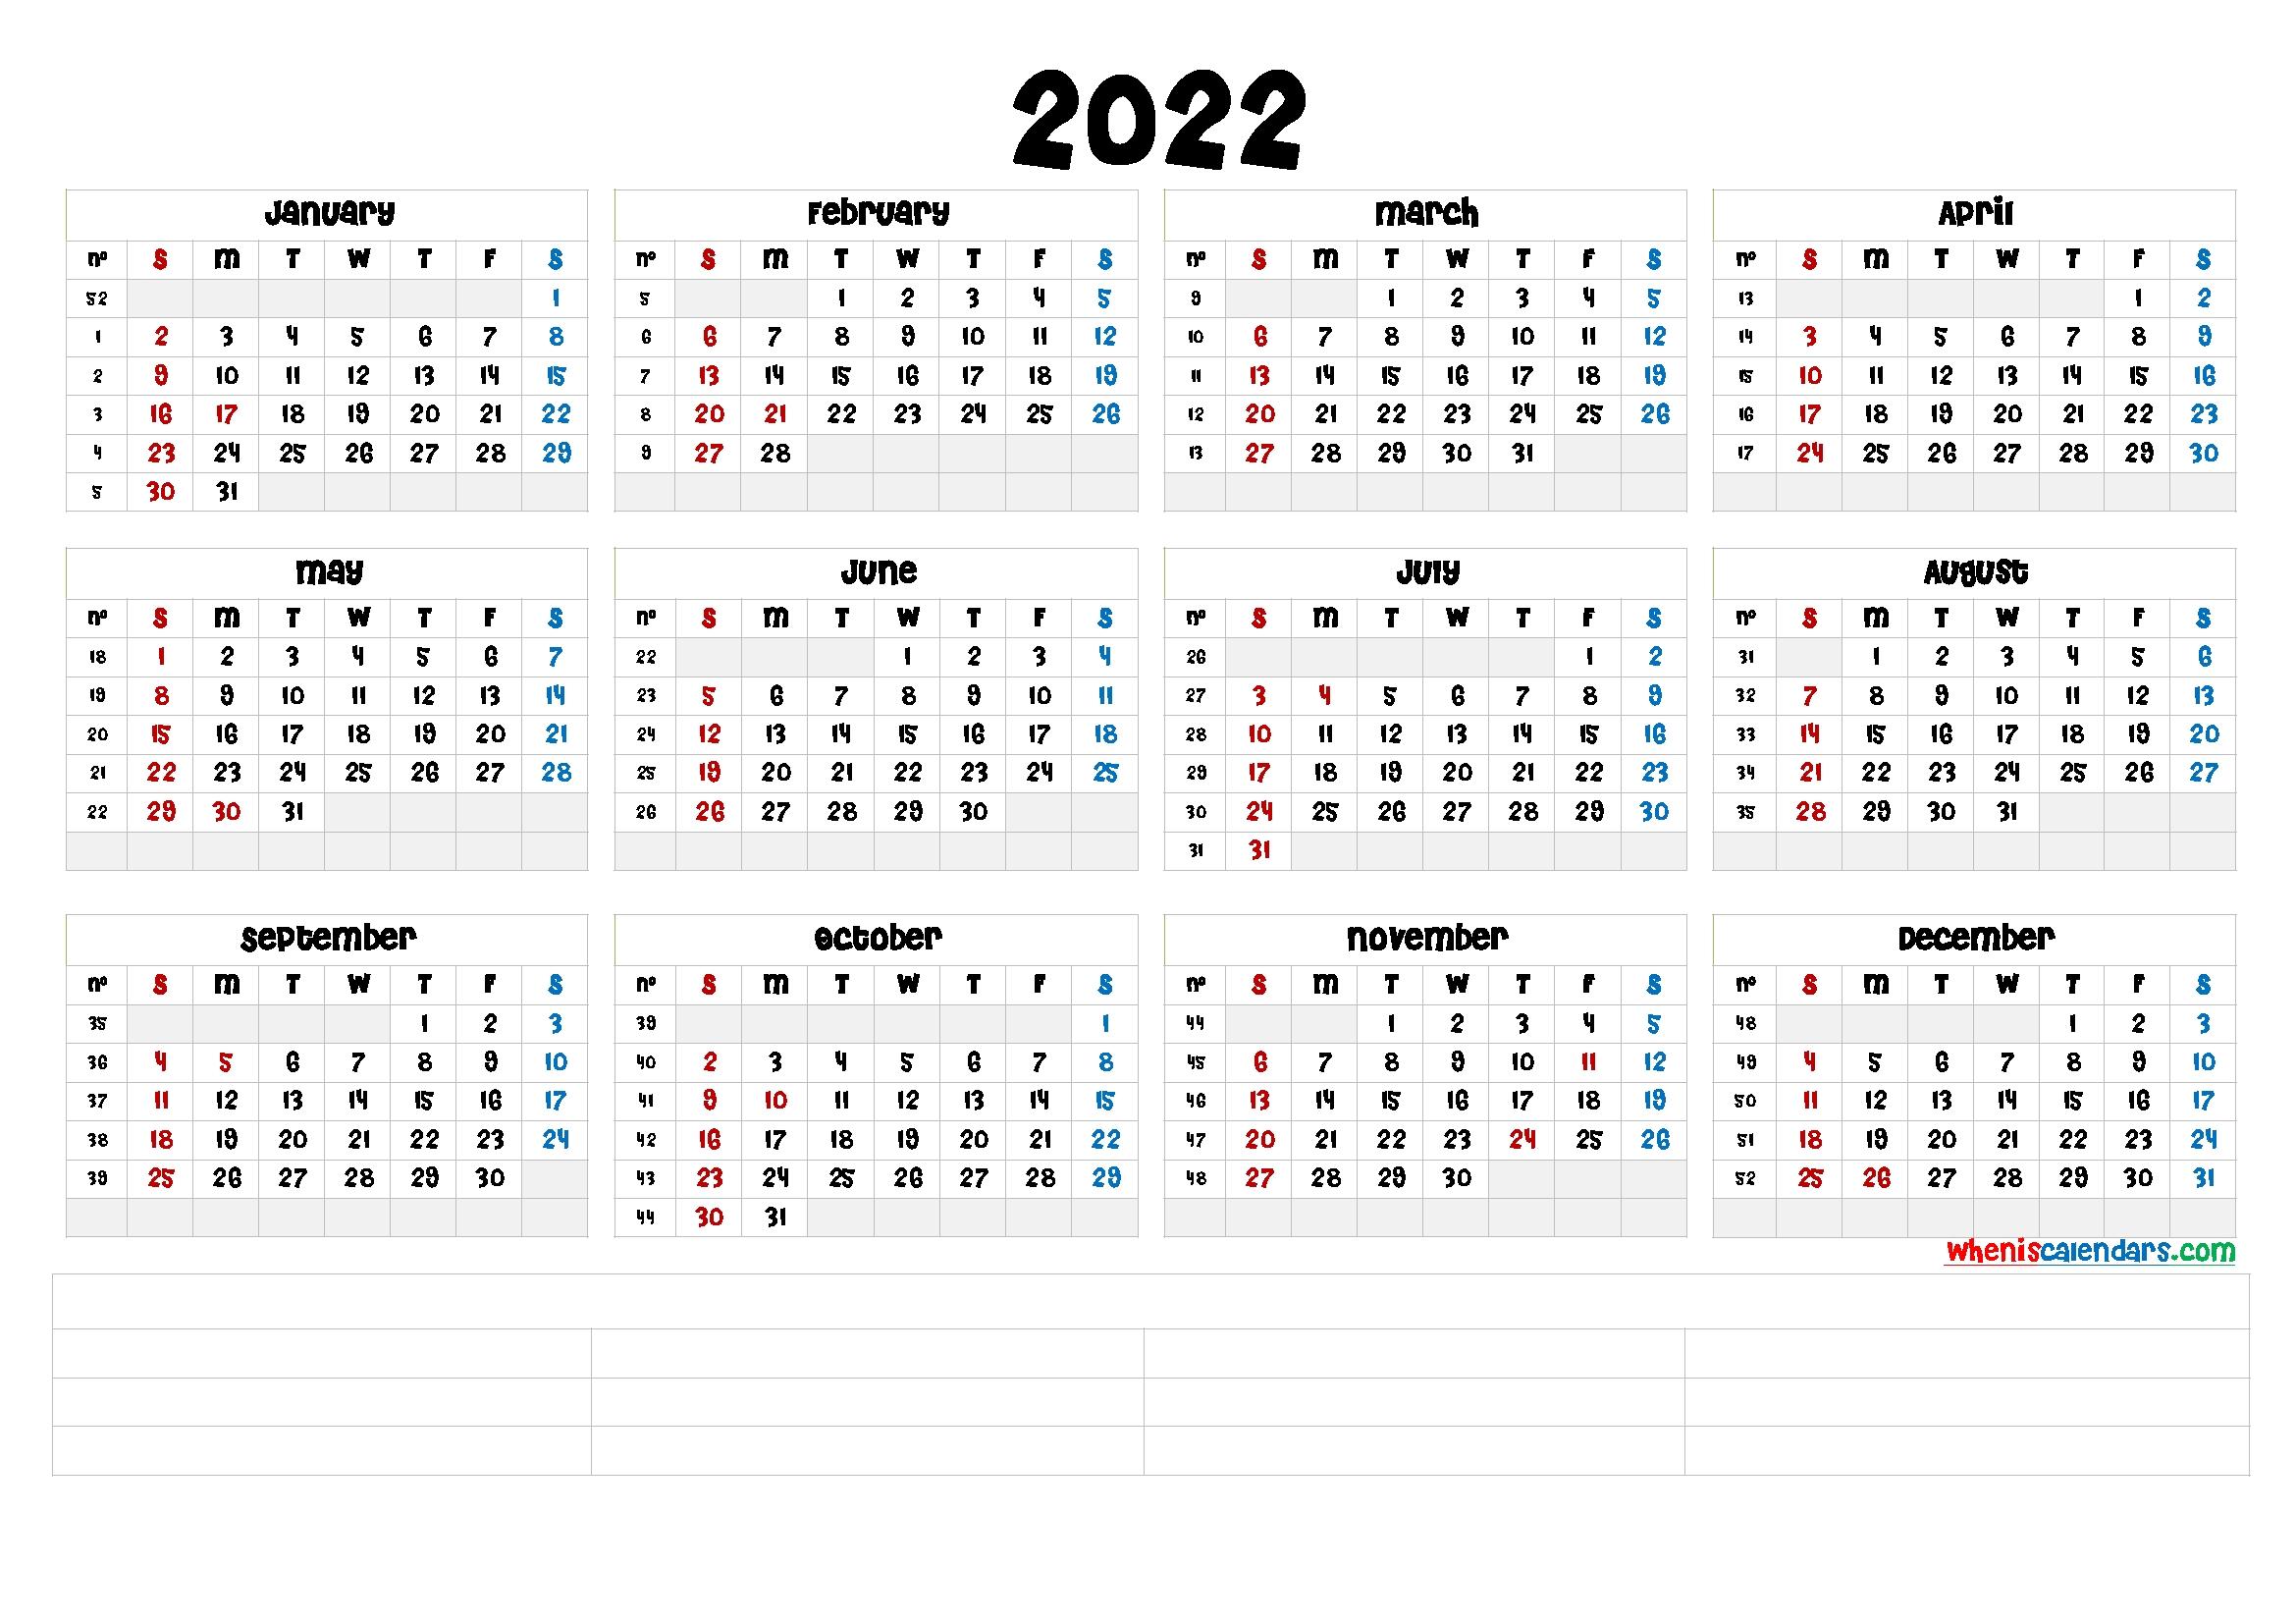 free printable 2022 calendar ::Download 2022 Printable Calendar